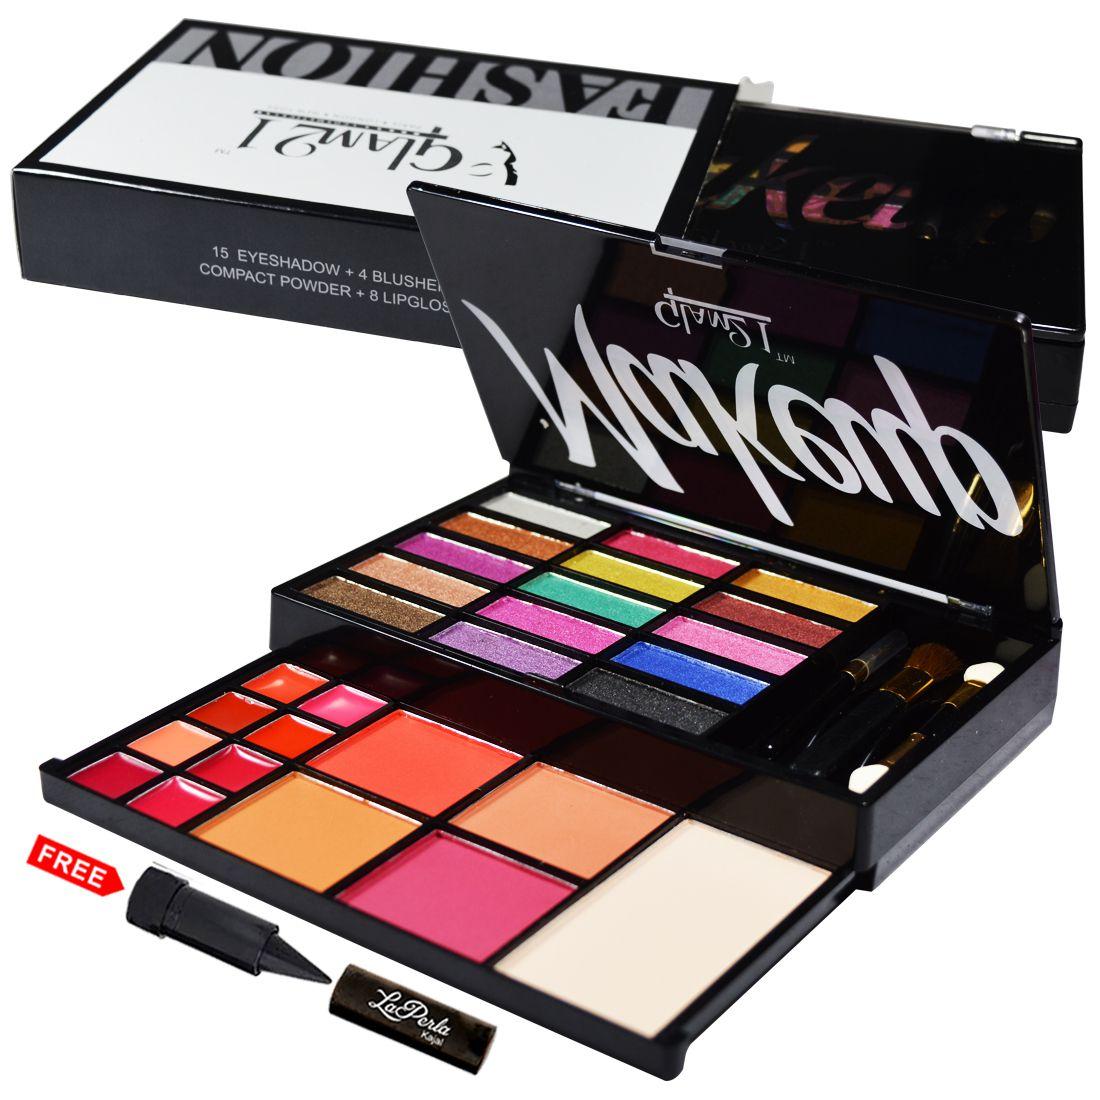 Glam21 Fashion Eyeshadow, Blusher And Lipgloss ES411-01 Makeup Kit 50